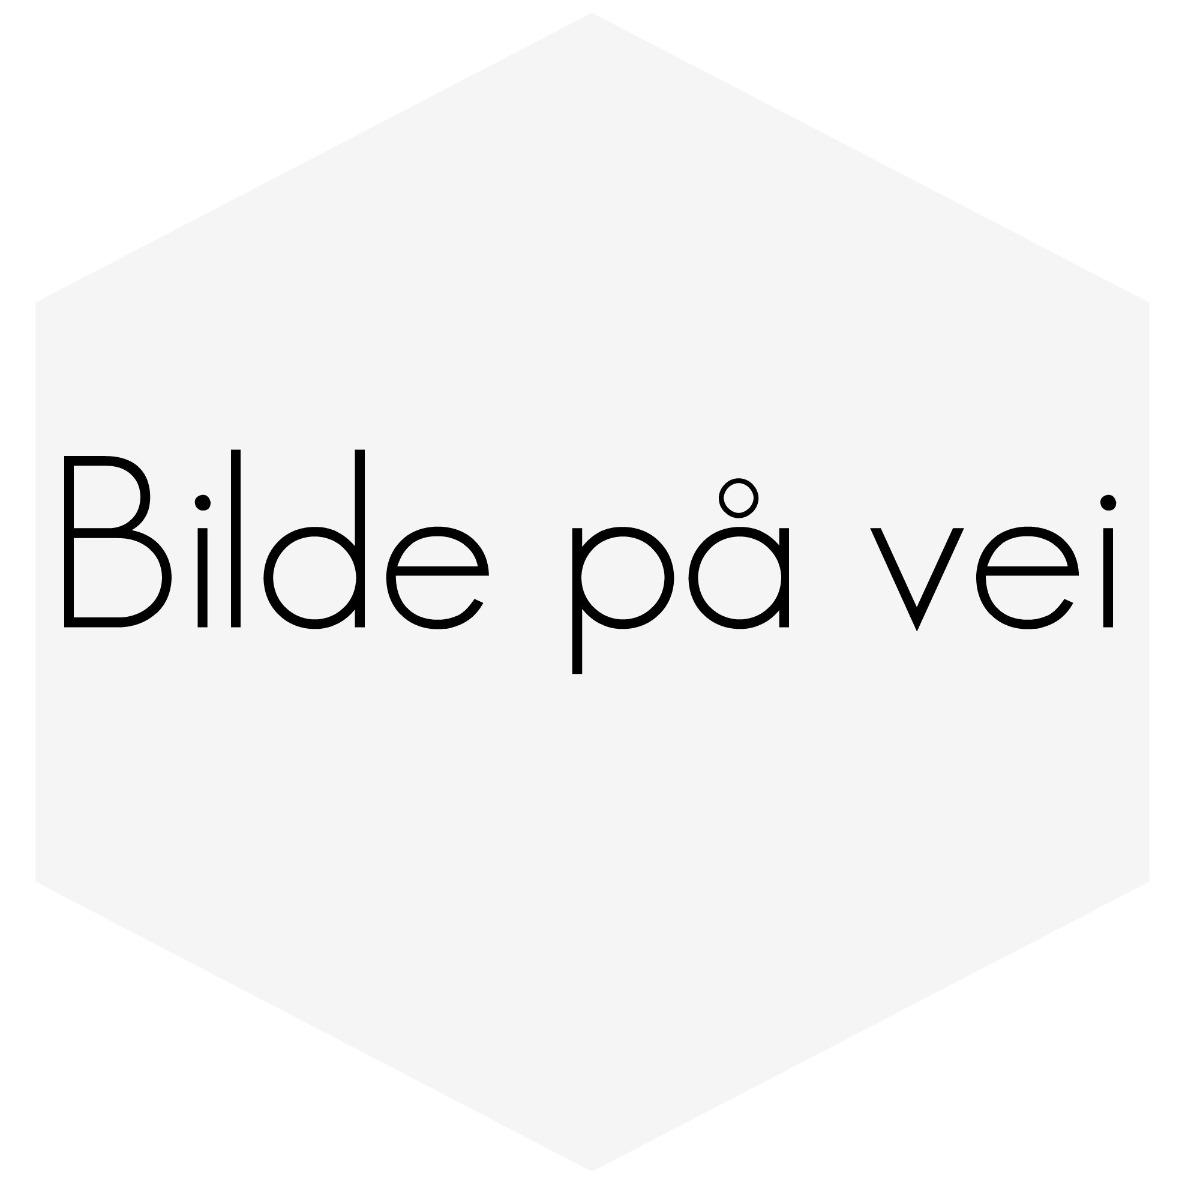 RATT SPARCO MONZA SEMSKET, ET POPULÆRT RALLY RATT